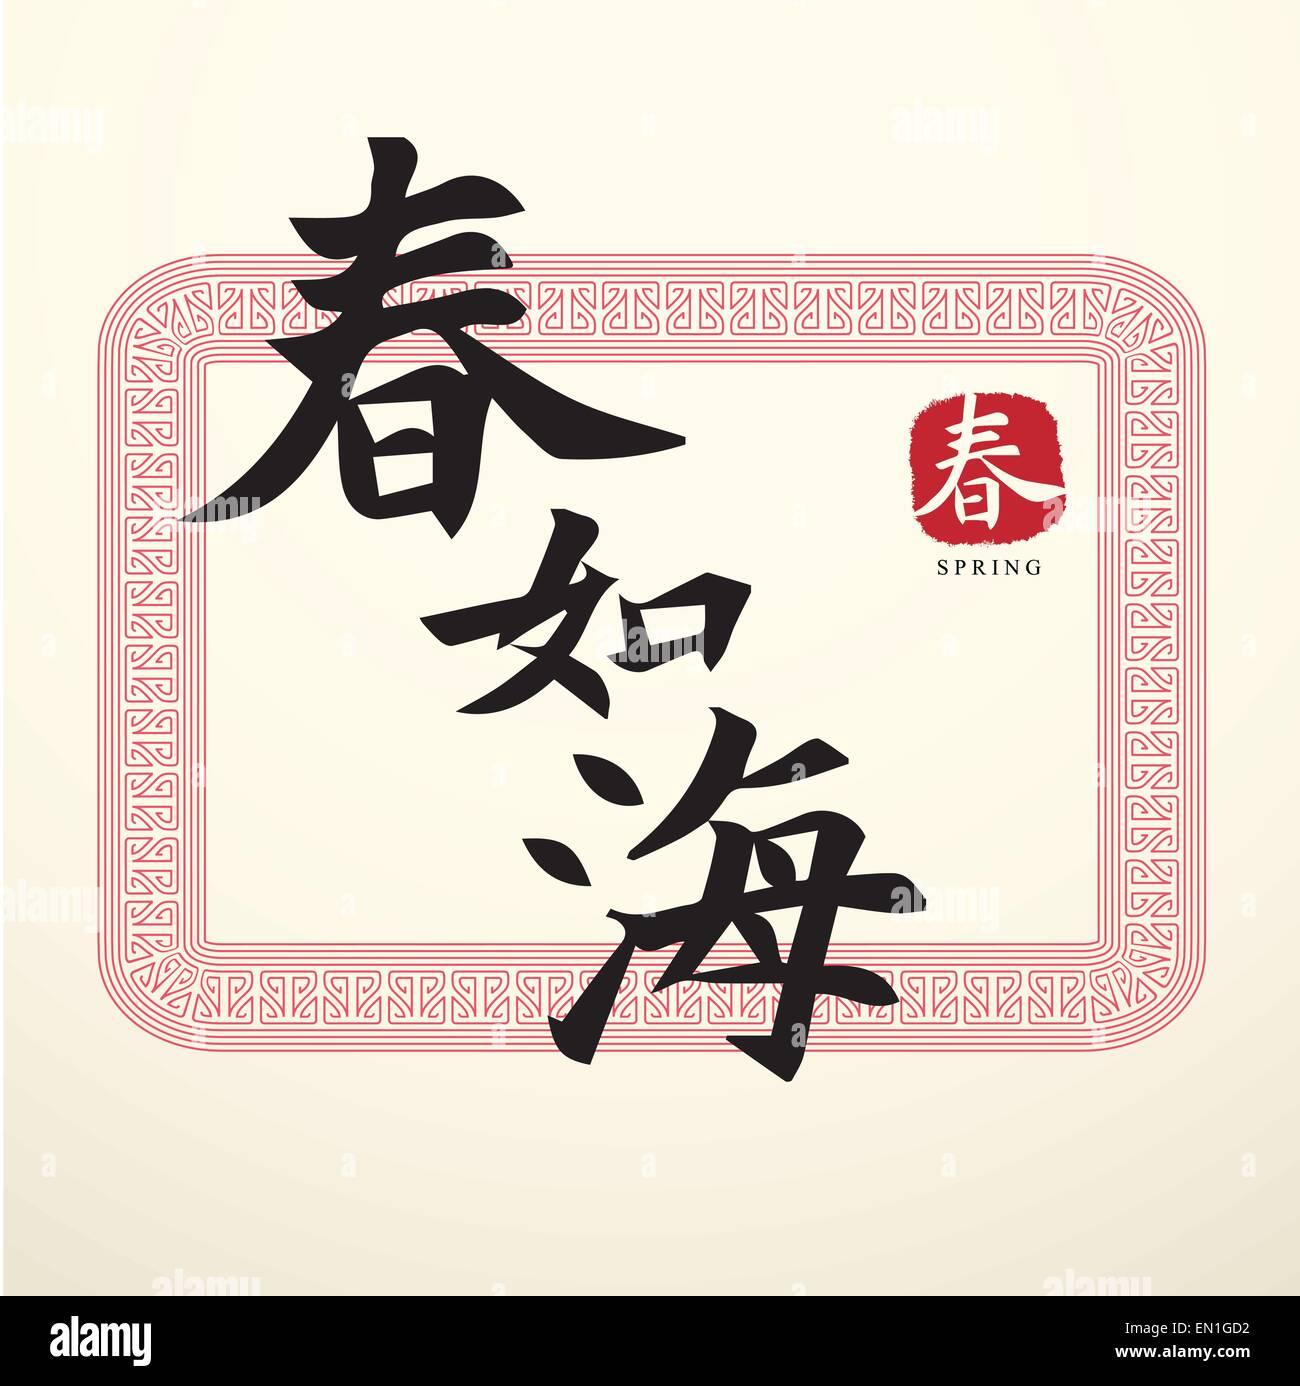 Flourish Chinese Character Symbol Writing Stock Photos Flourish